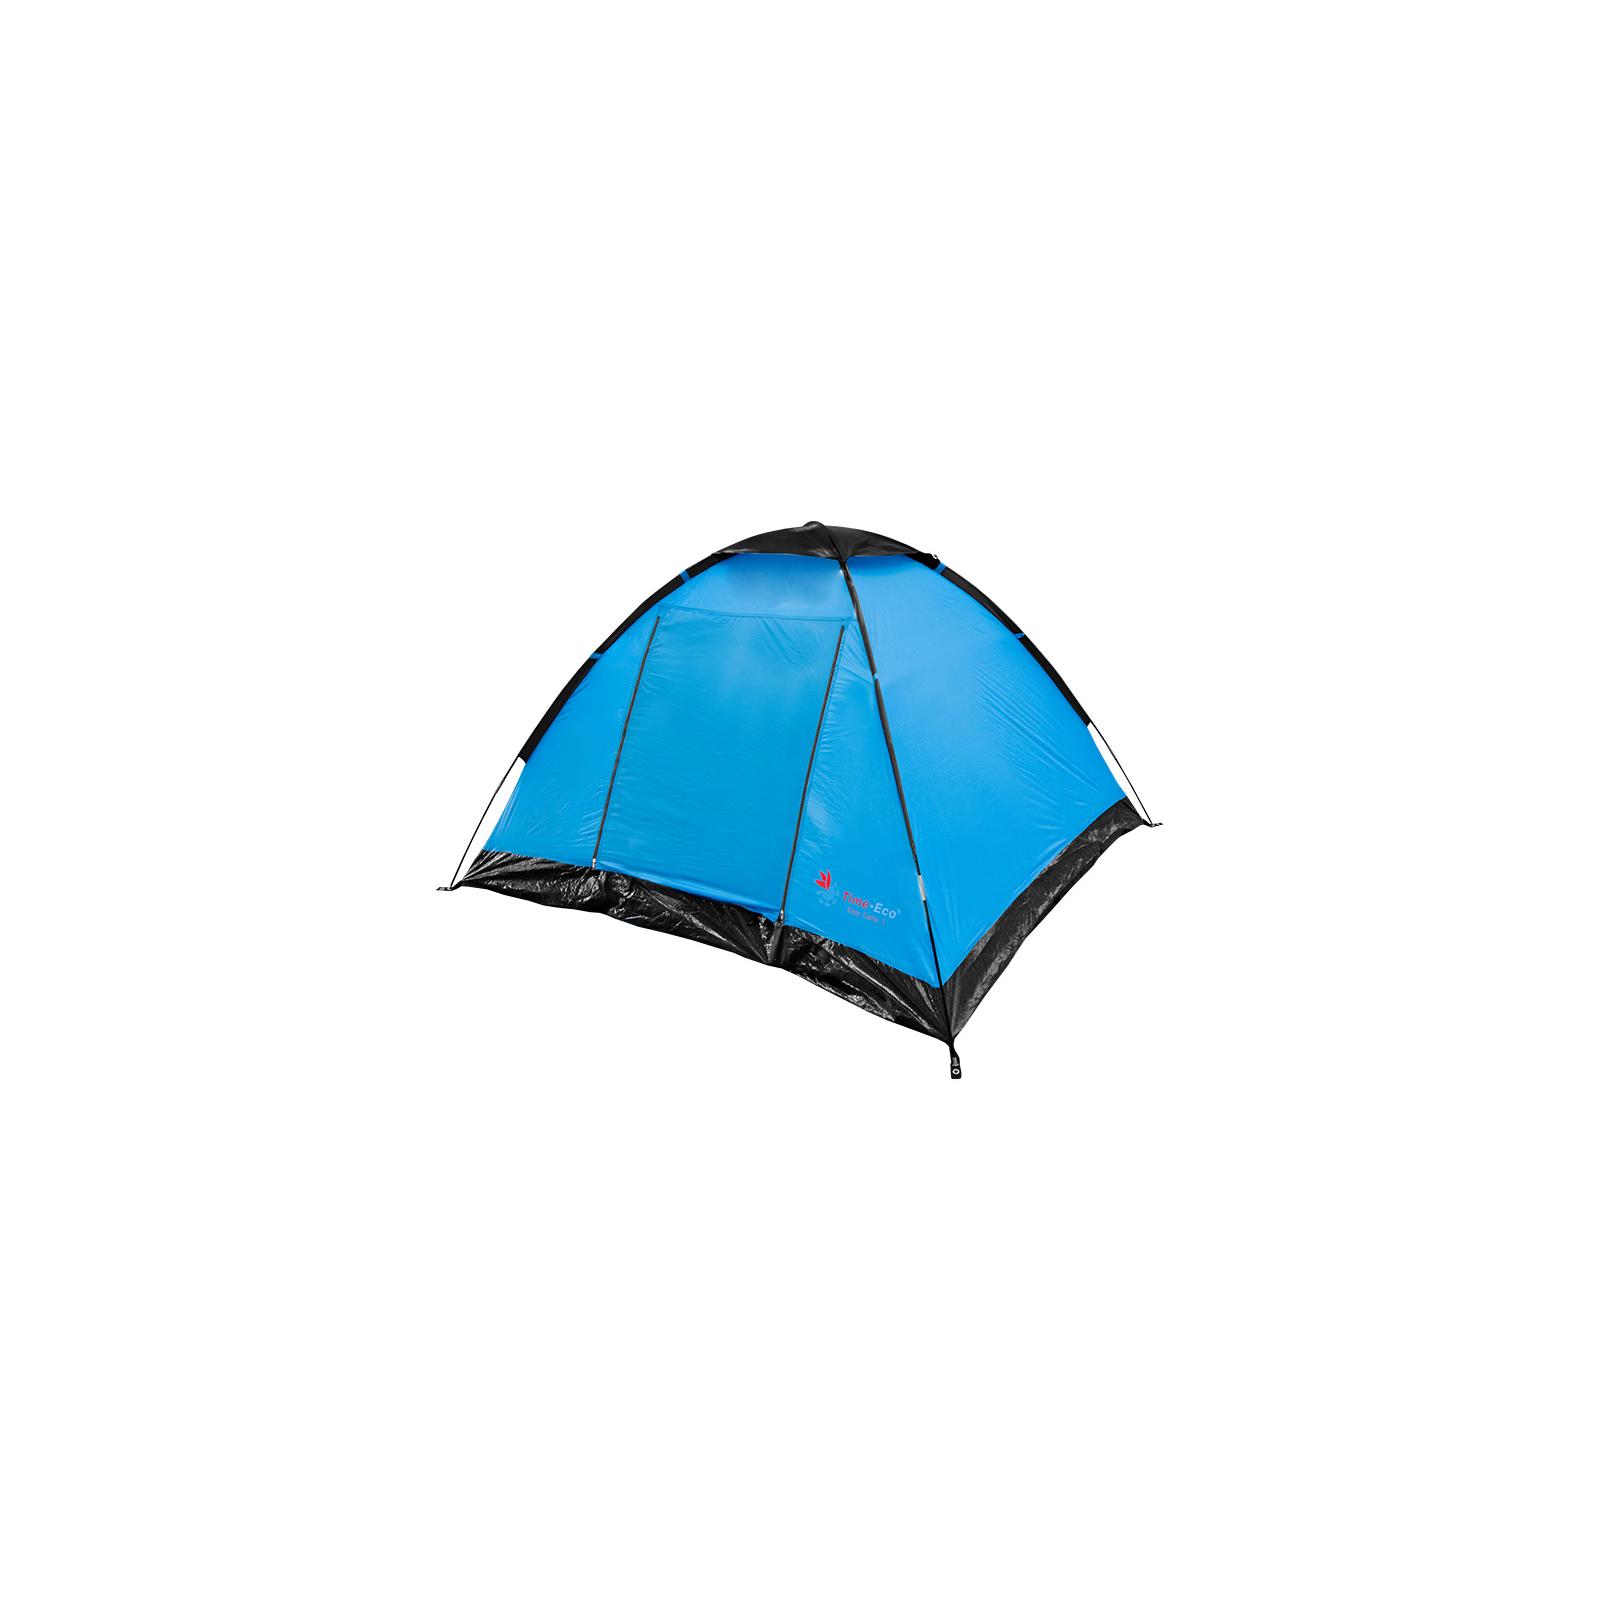 Палатка Time Eco Easy Camp-3 изображение 2